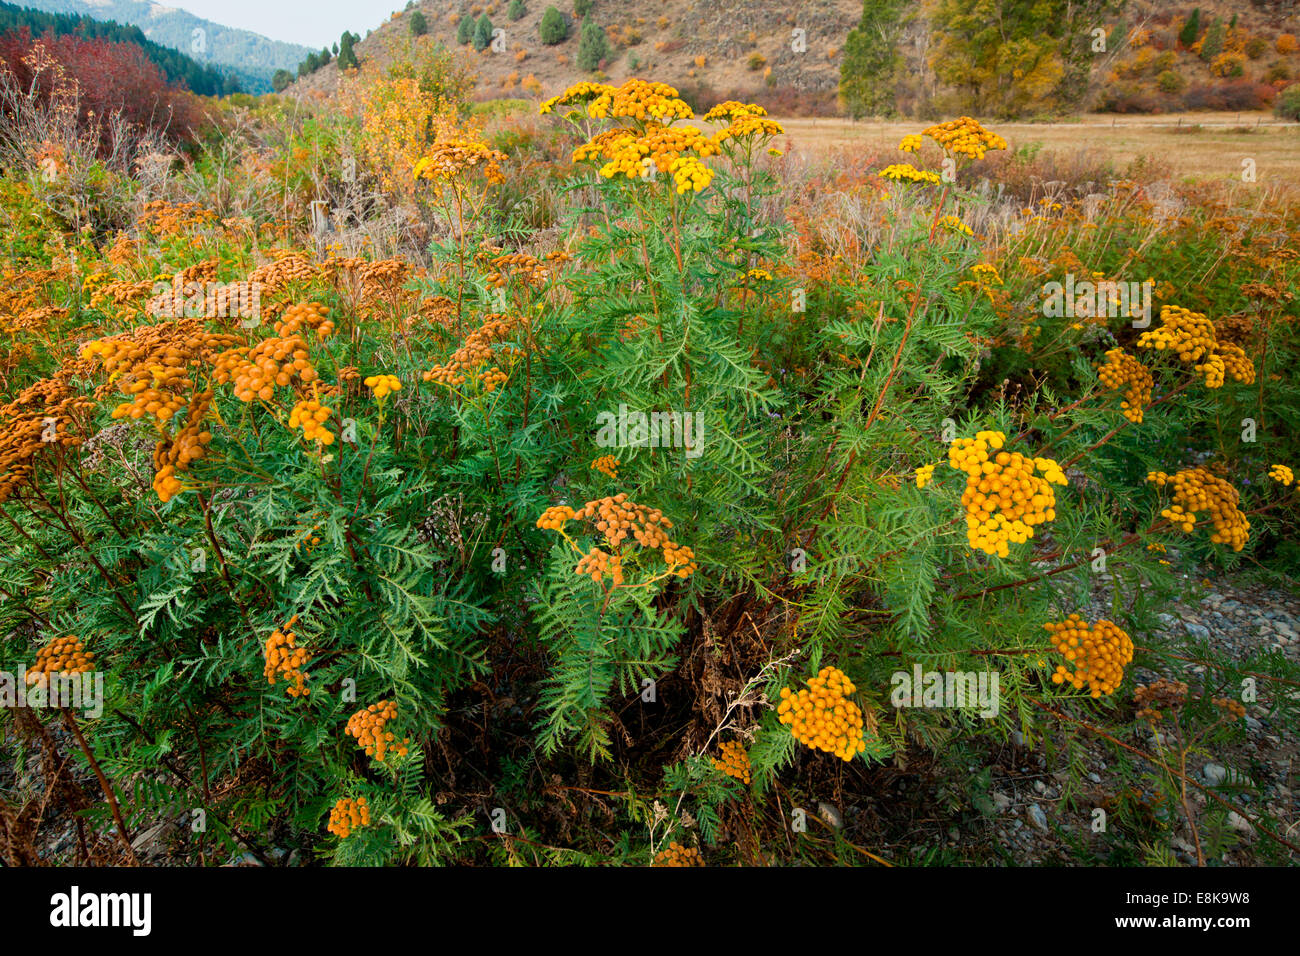 Wildflowers in autumn, Idaho, USA. - Stock Image